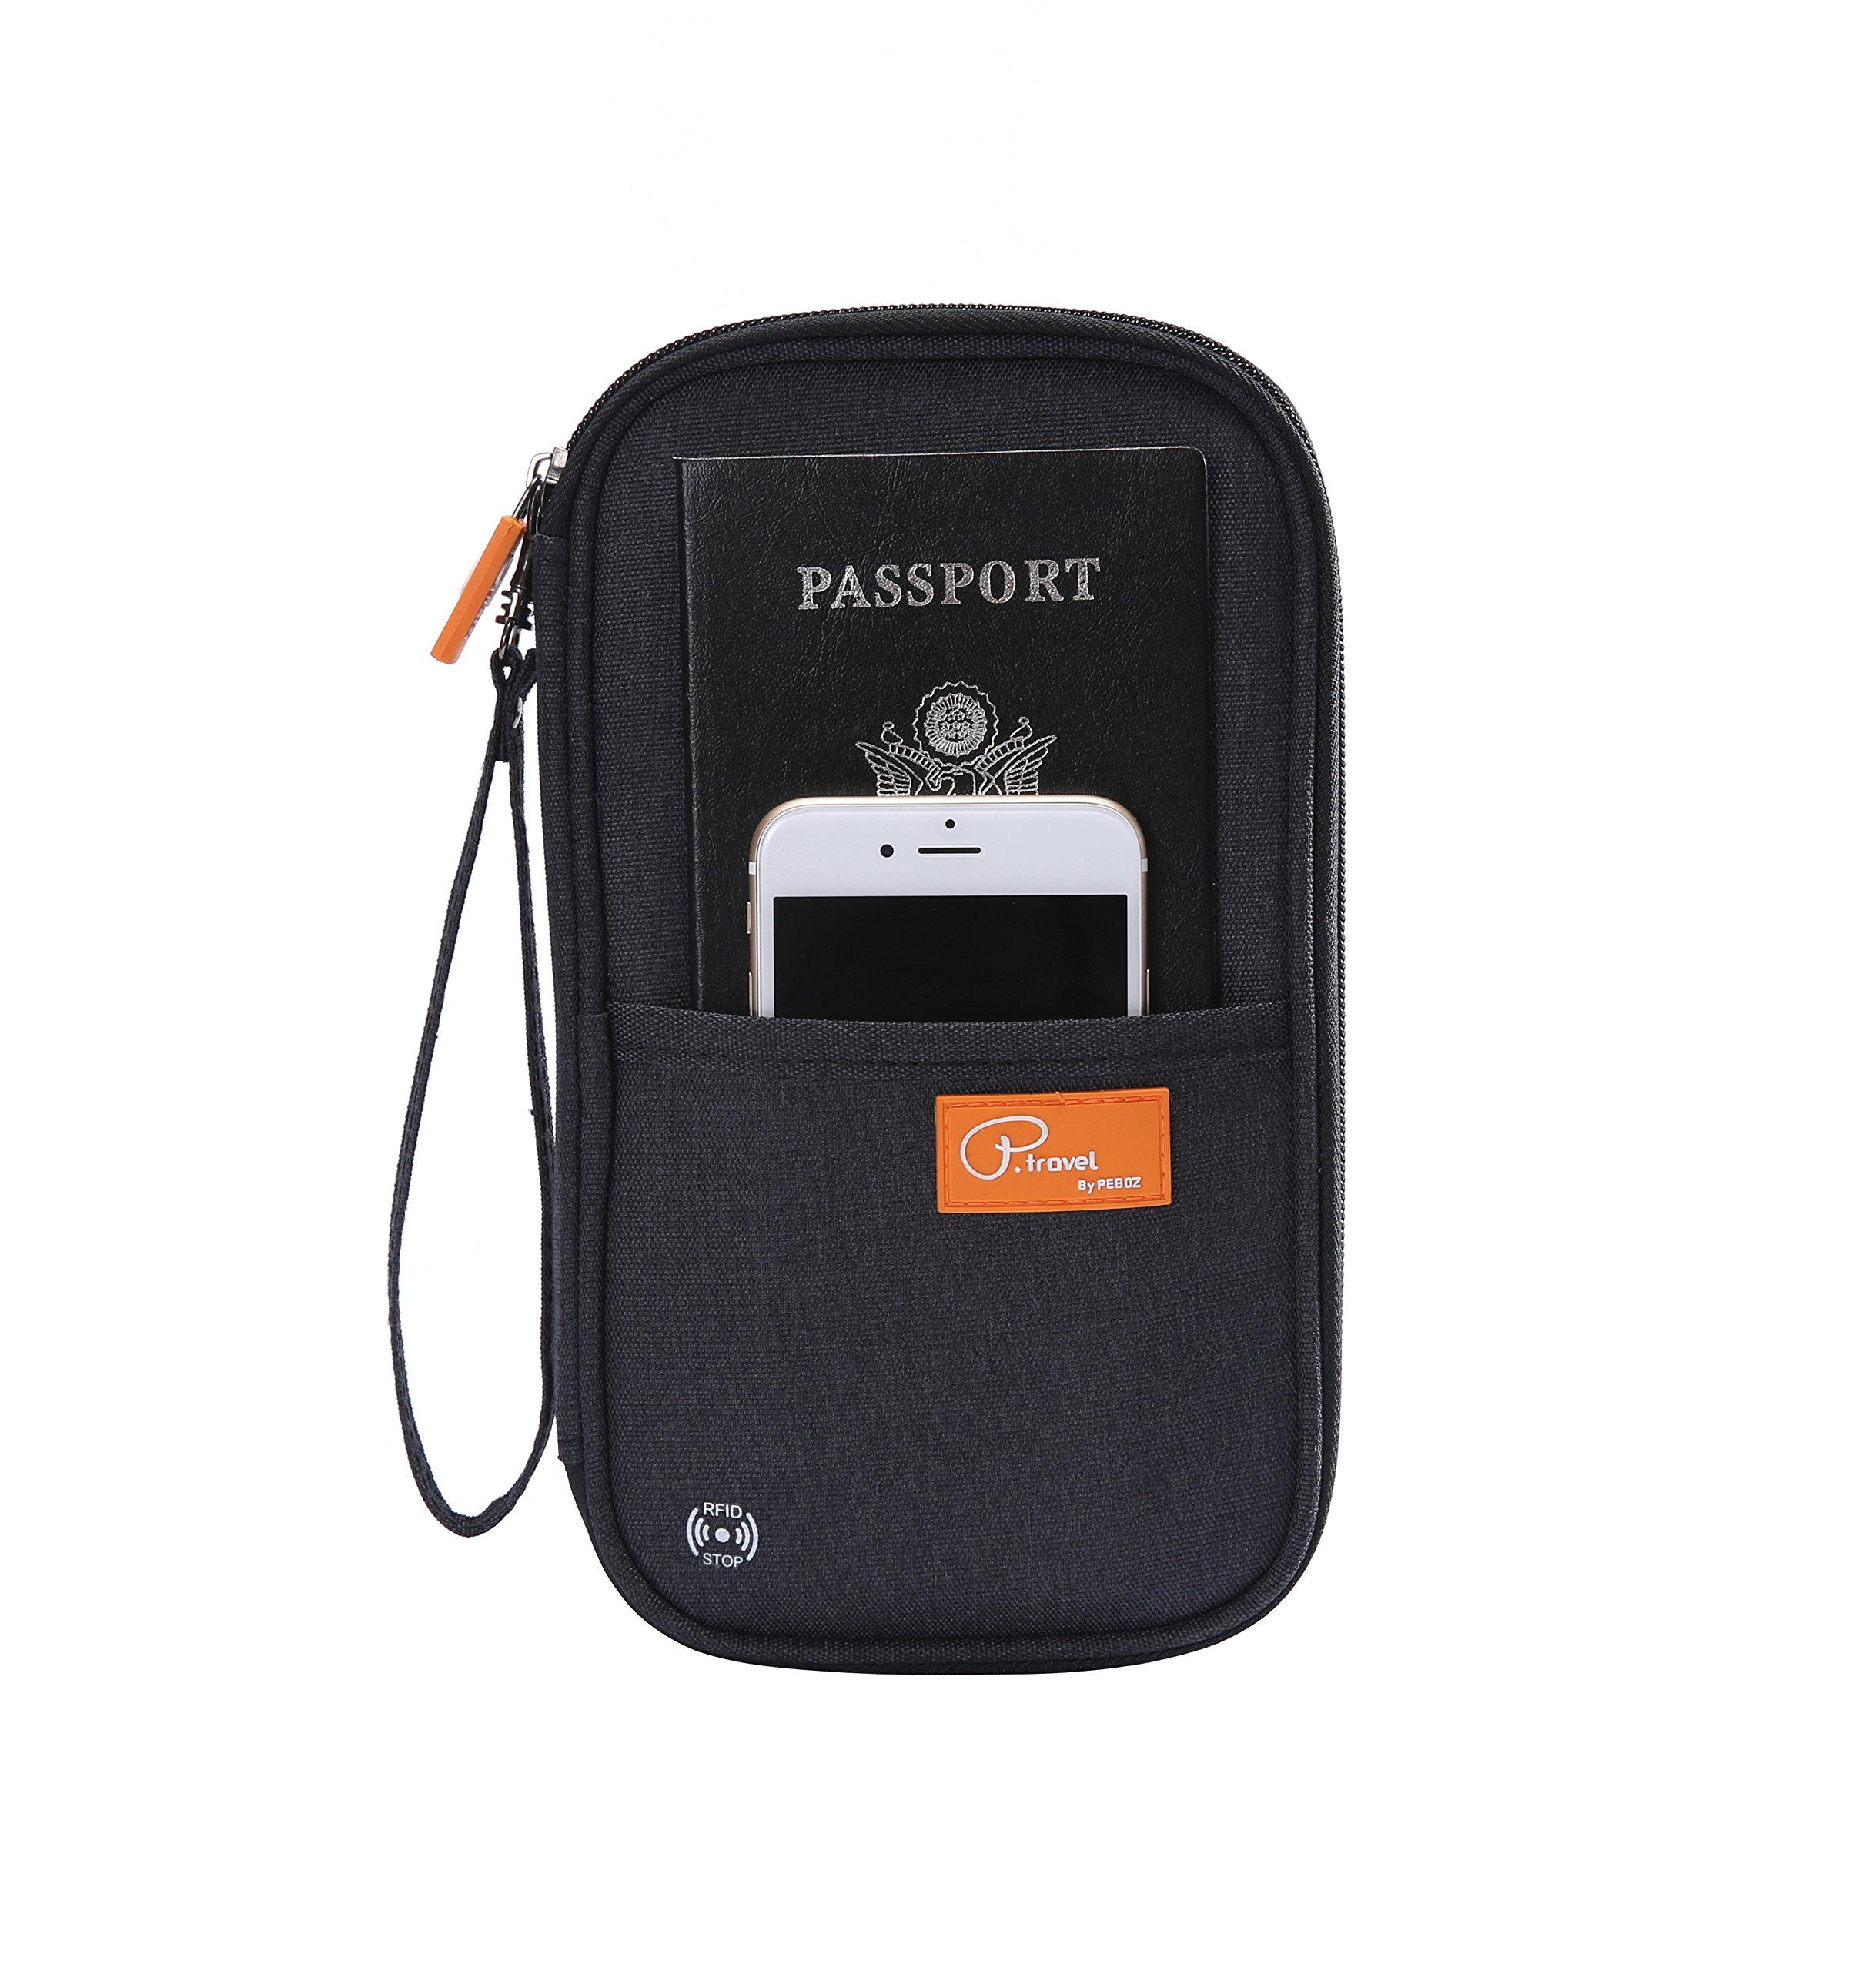 RFID Blocking Travel Passport Wallet & Family Passport Holder, Waterproof Multiple Document Organizer (Black)